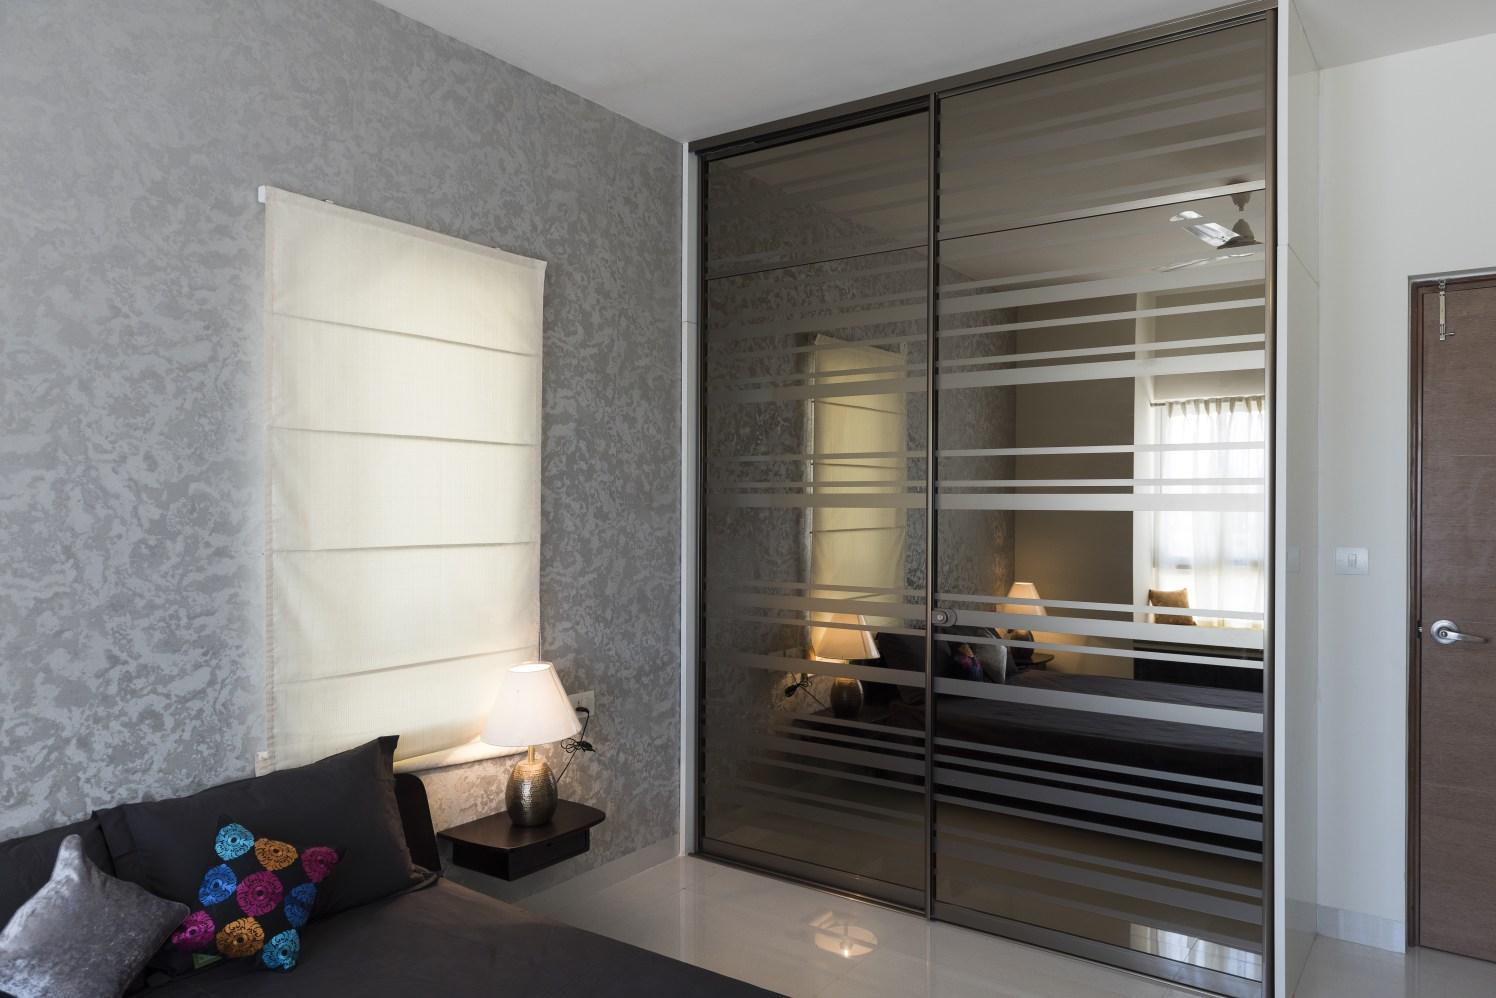 Exquisite Elegance by HomeLane Bedroom Contemporary | Interior Design Photos & Ideas